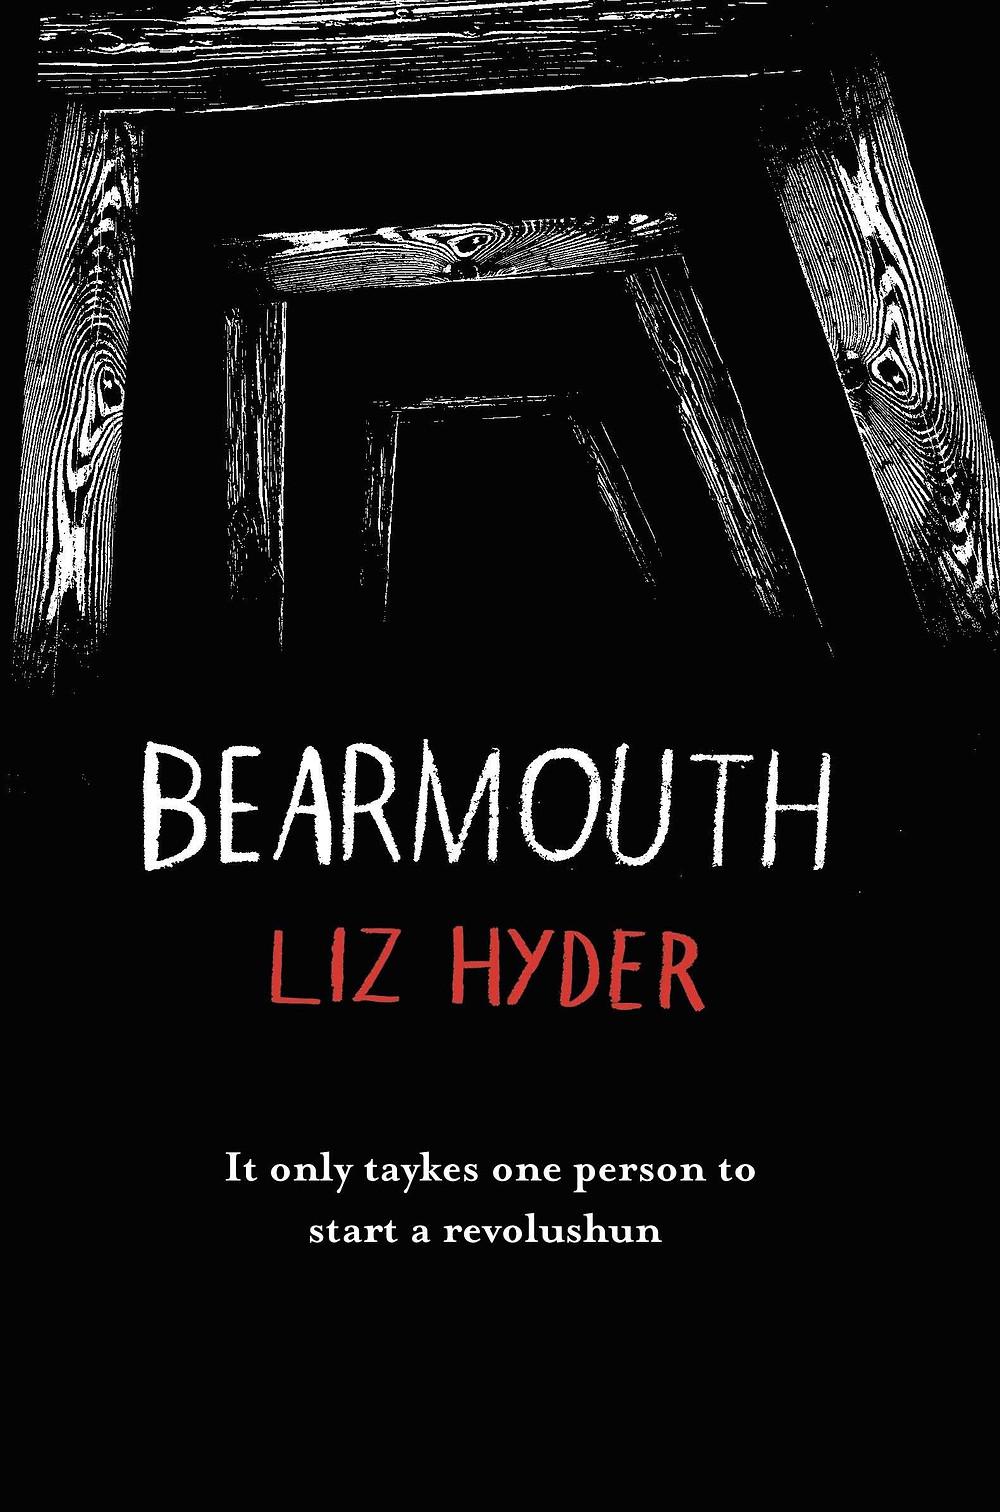 Bearmouth By Liz Hyder : thebookslut book reviews the book slut